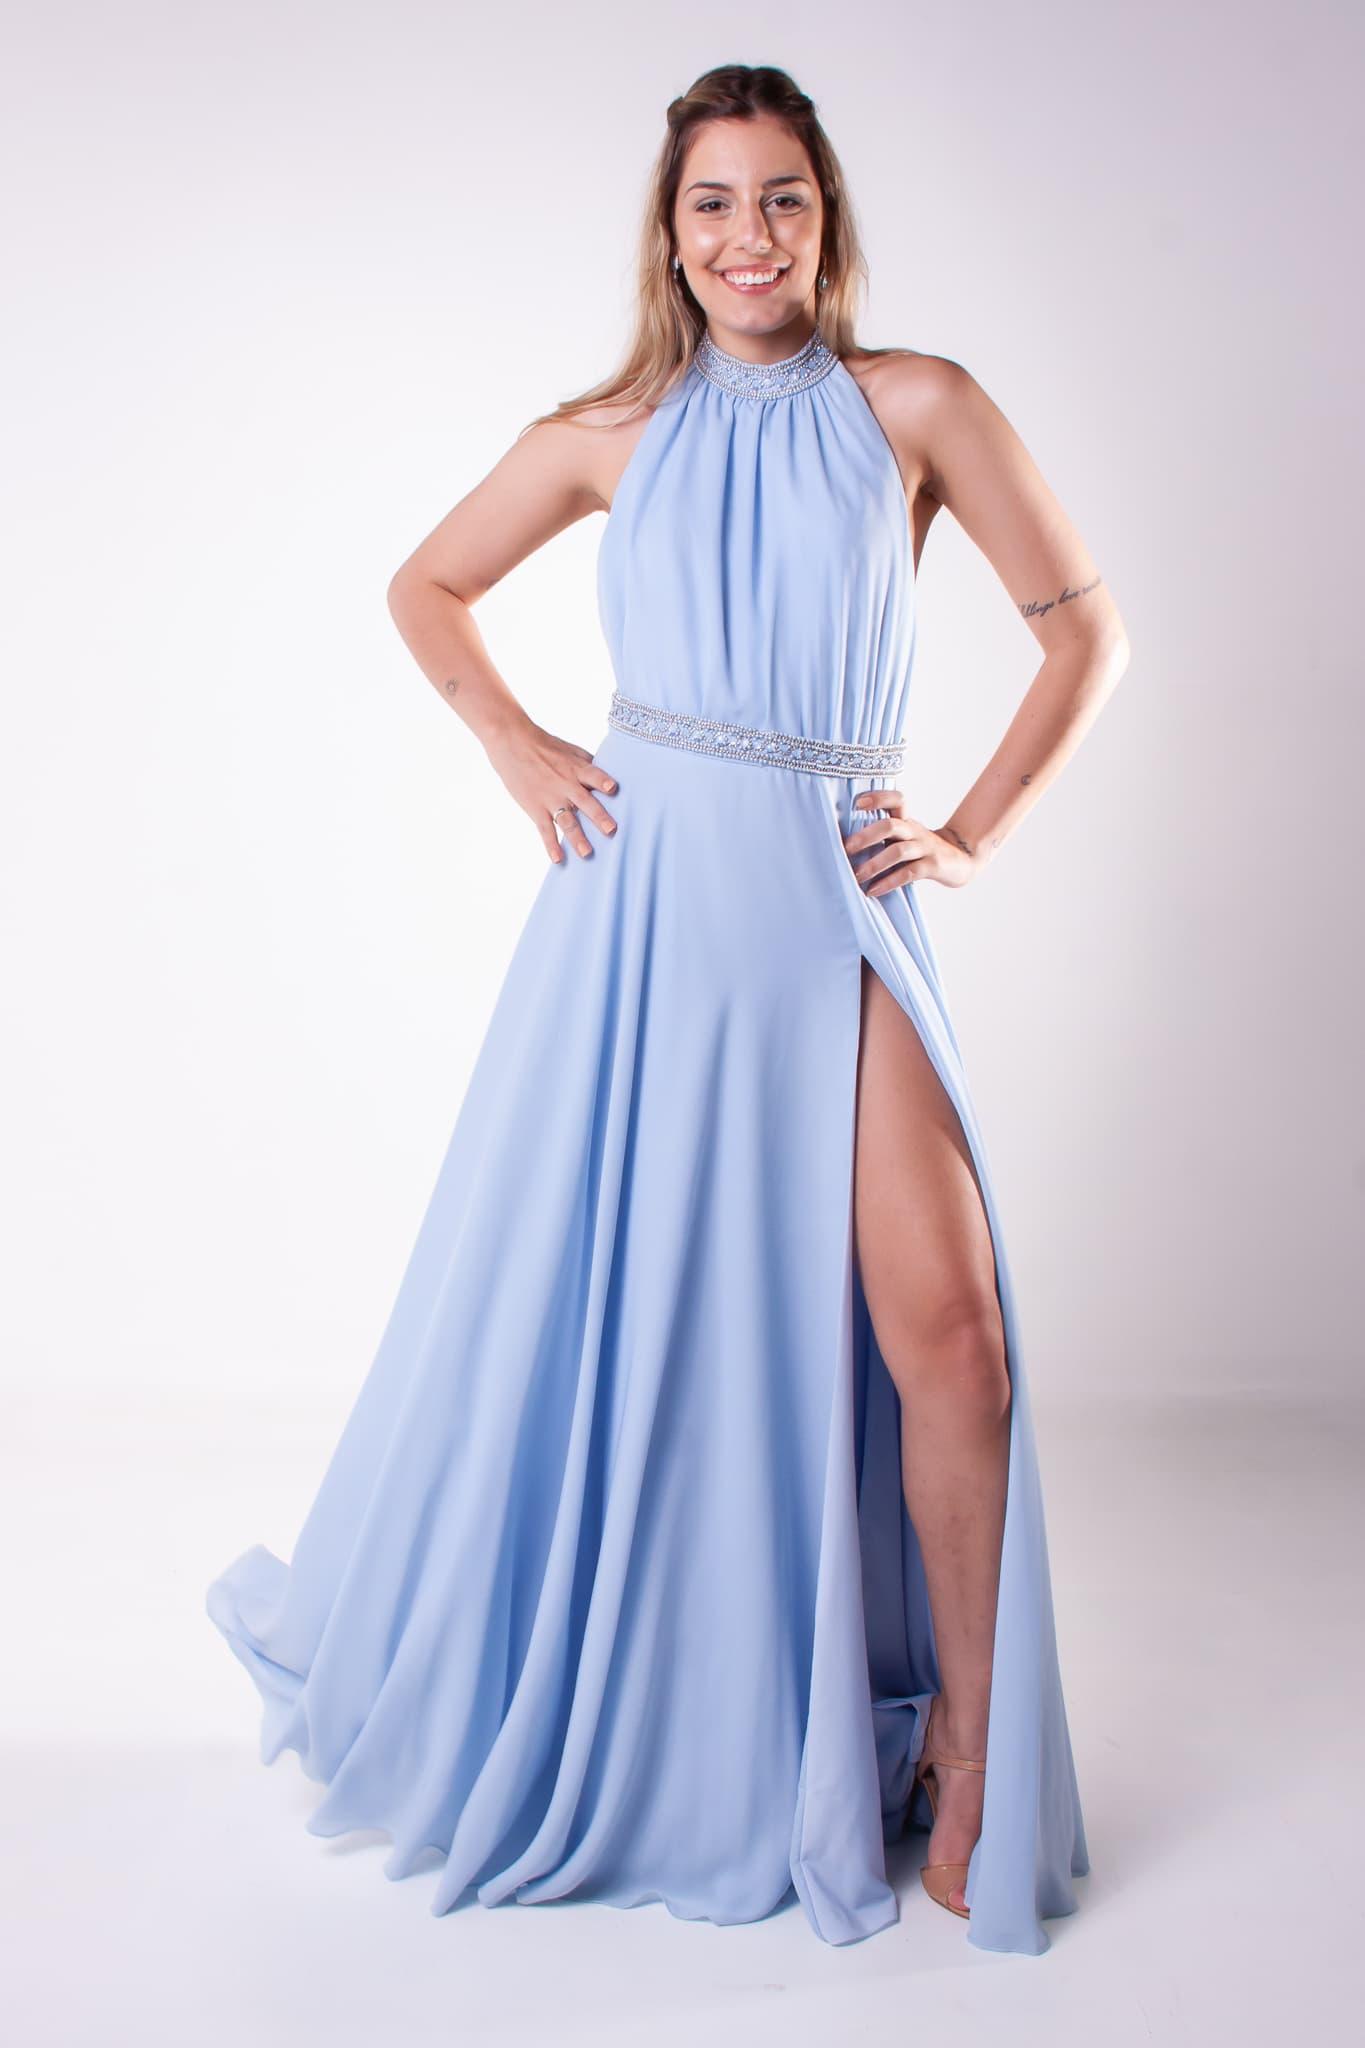 50 - Vestido azul serenity com fenda e open back